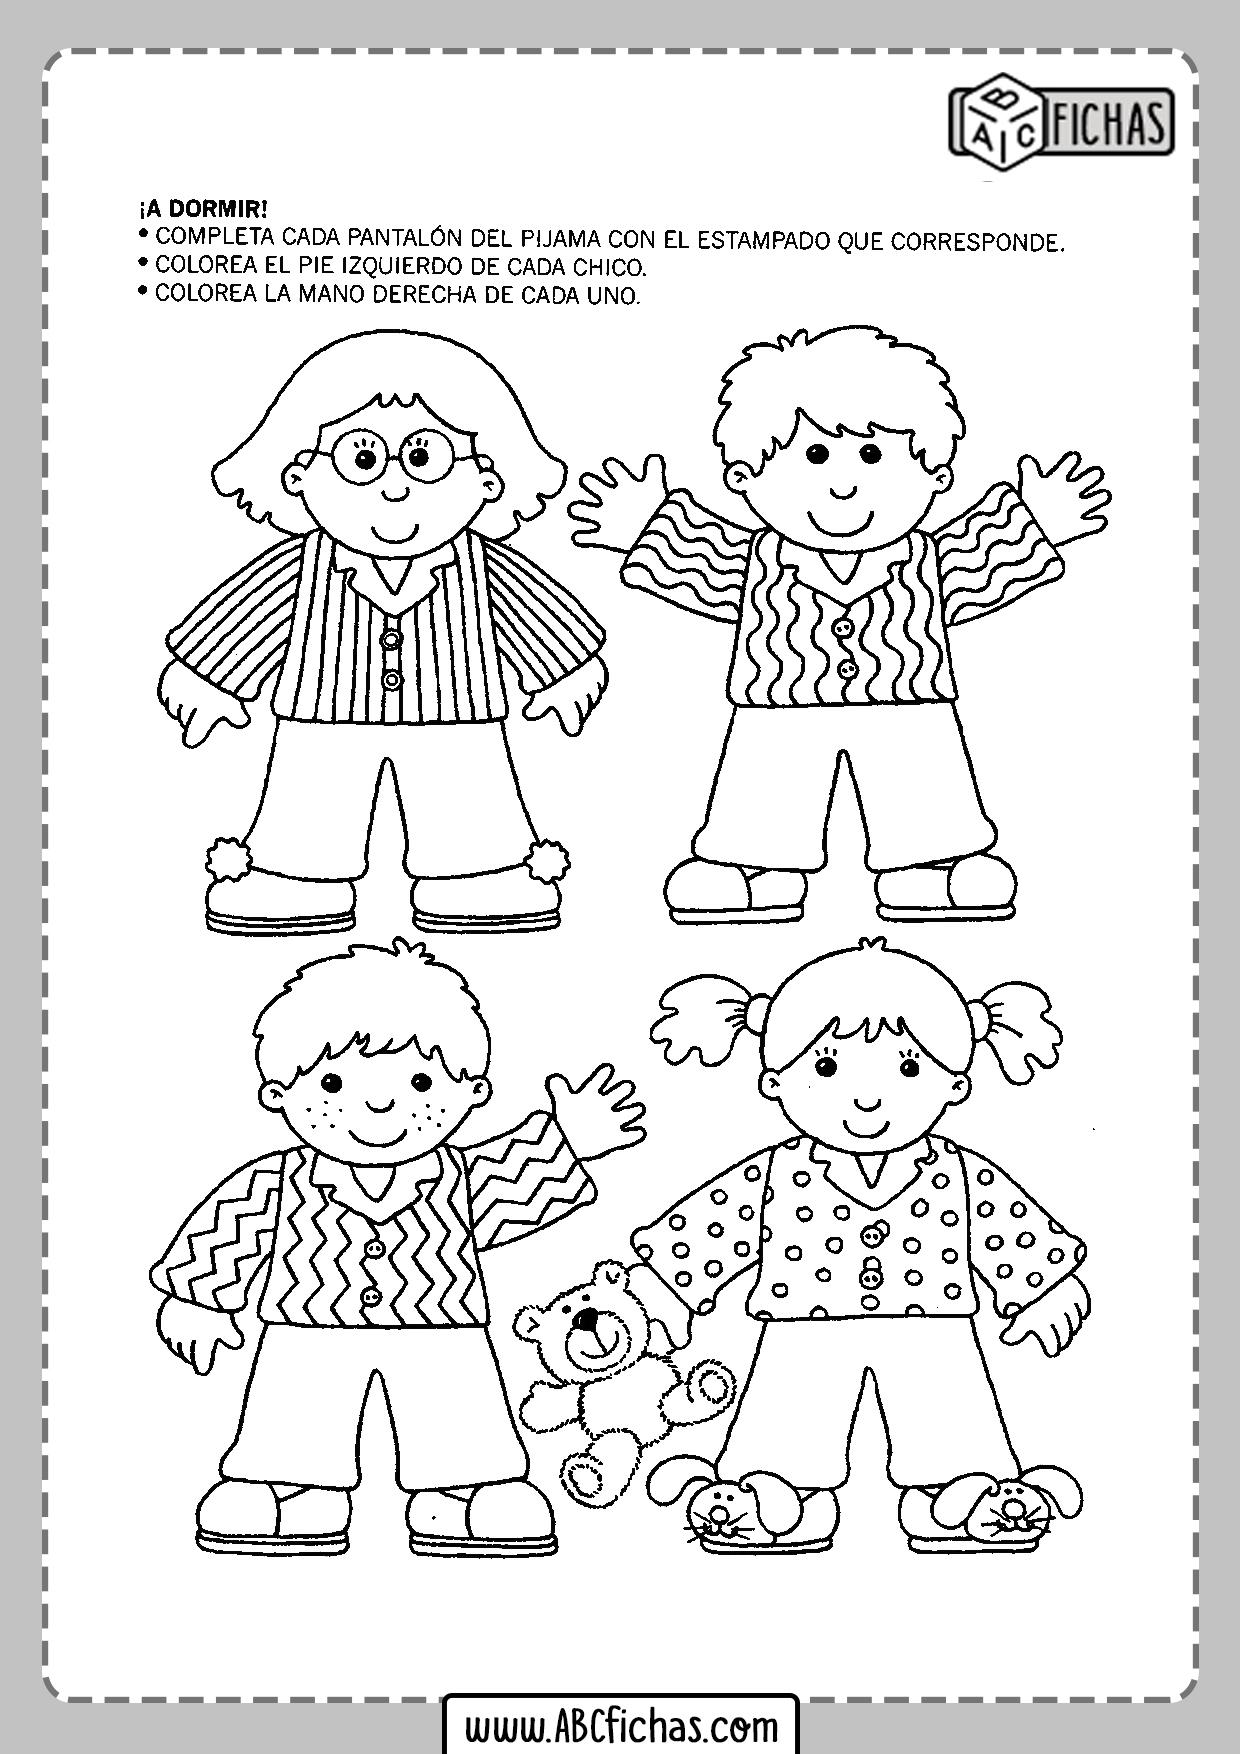 Fichas de preescolar en pdf para imprimir